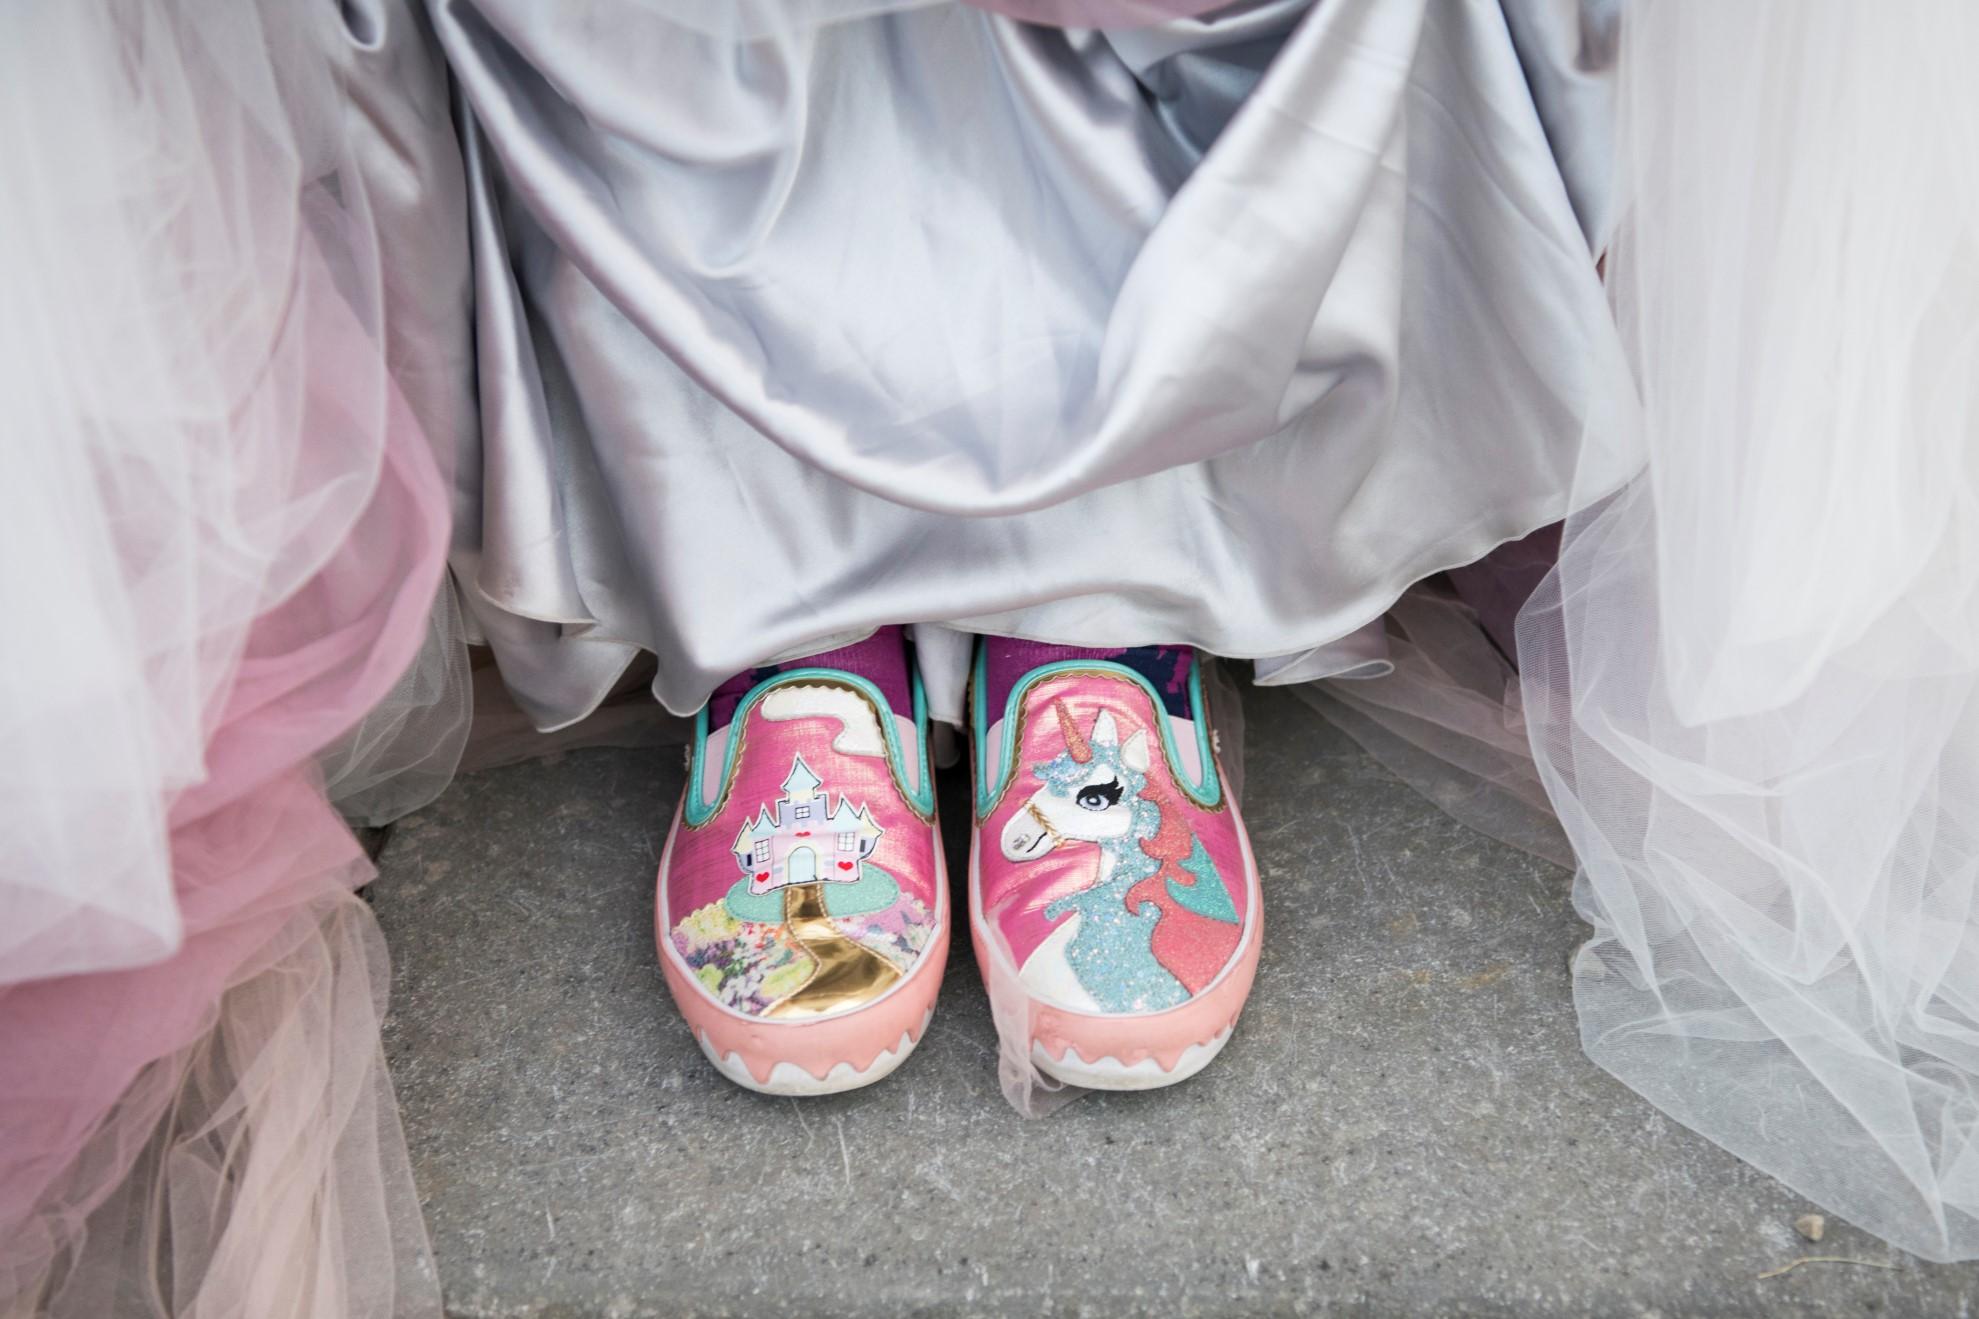 Zoo Wedding- Emma May Photography- Unconventional Wedding- Unique Wedding Inspiration- Quirky Wedding Shoes